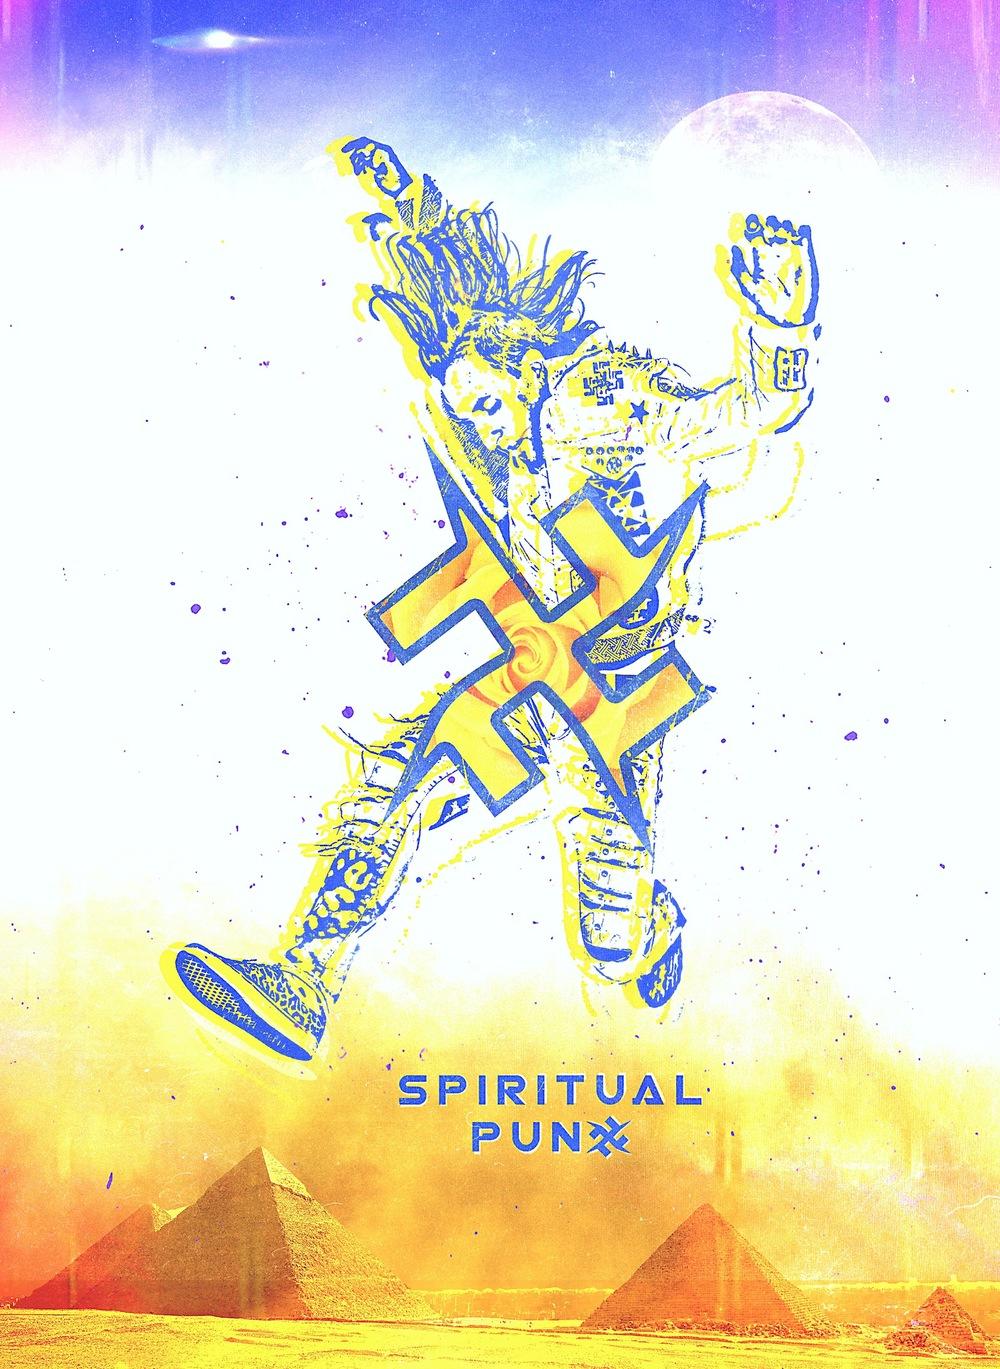 JUMP-Spiritual-Punx.jpg